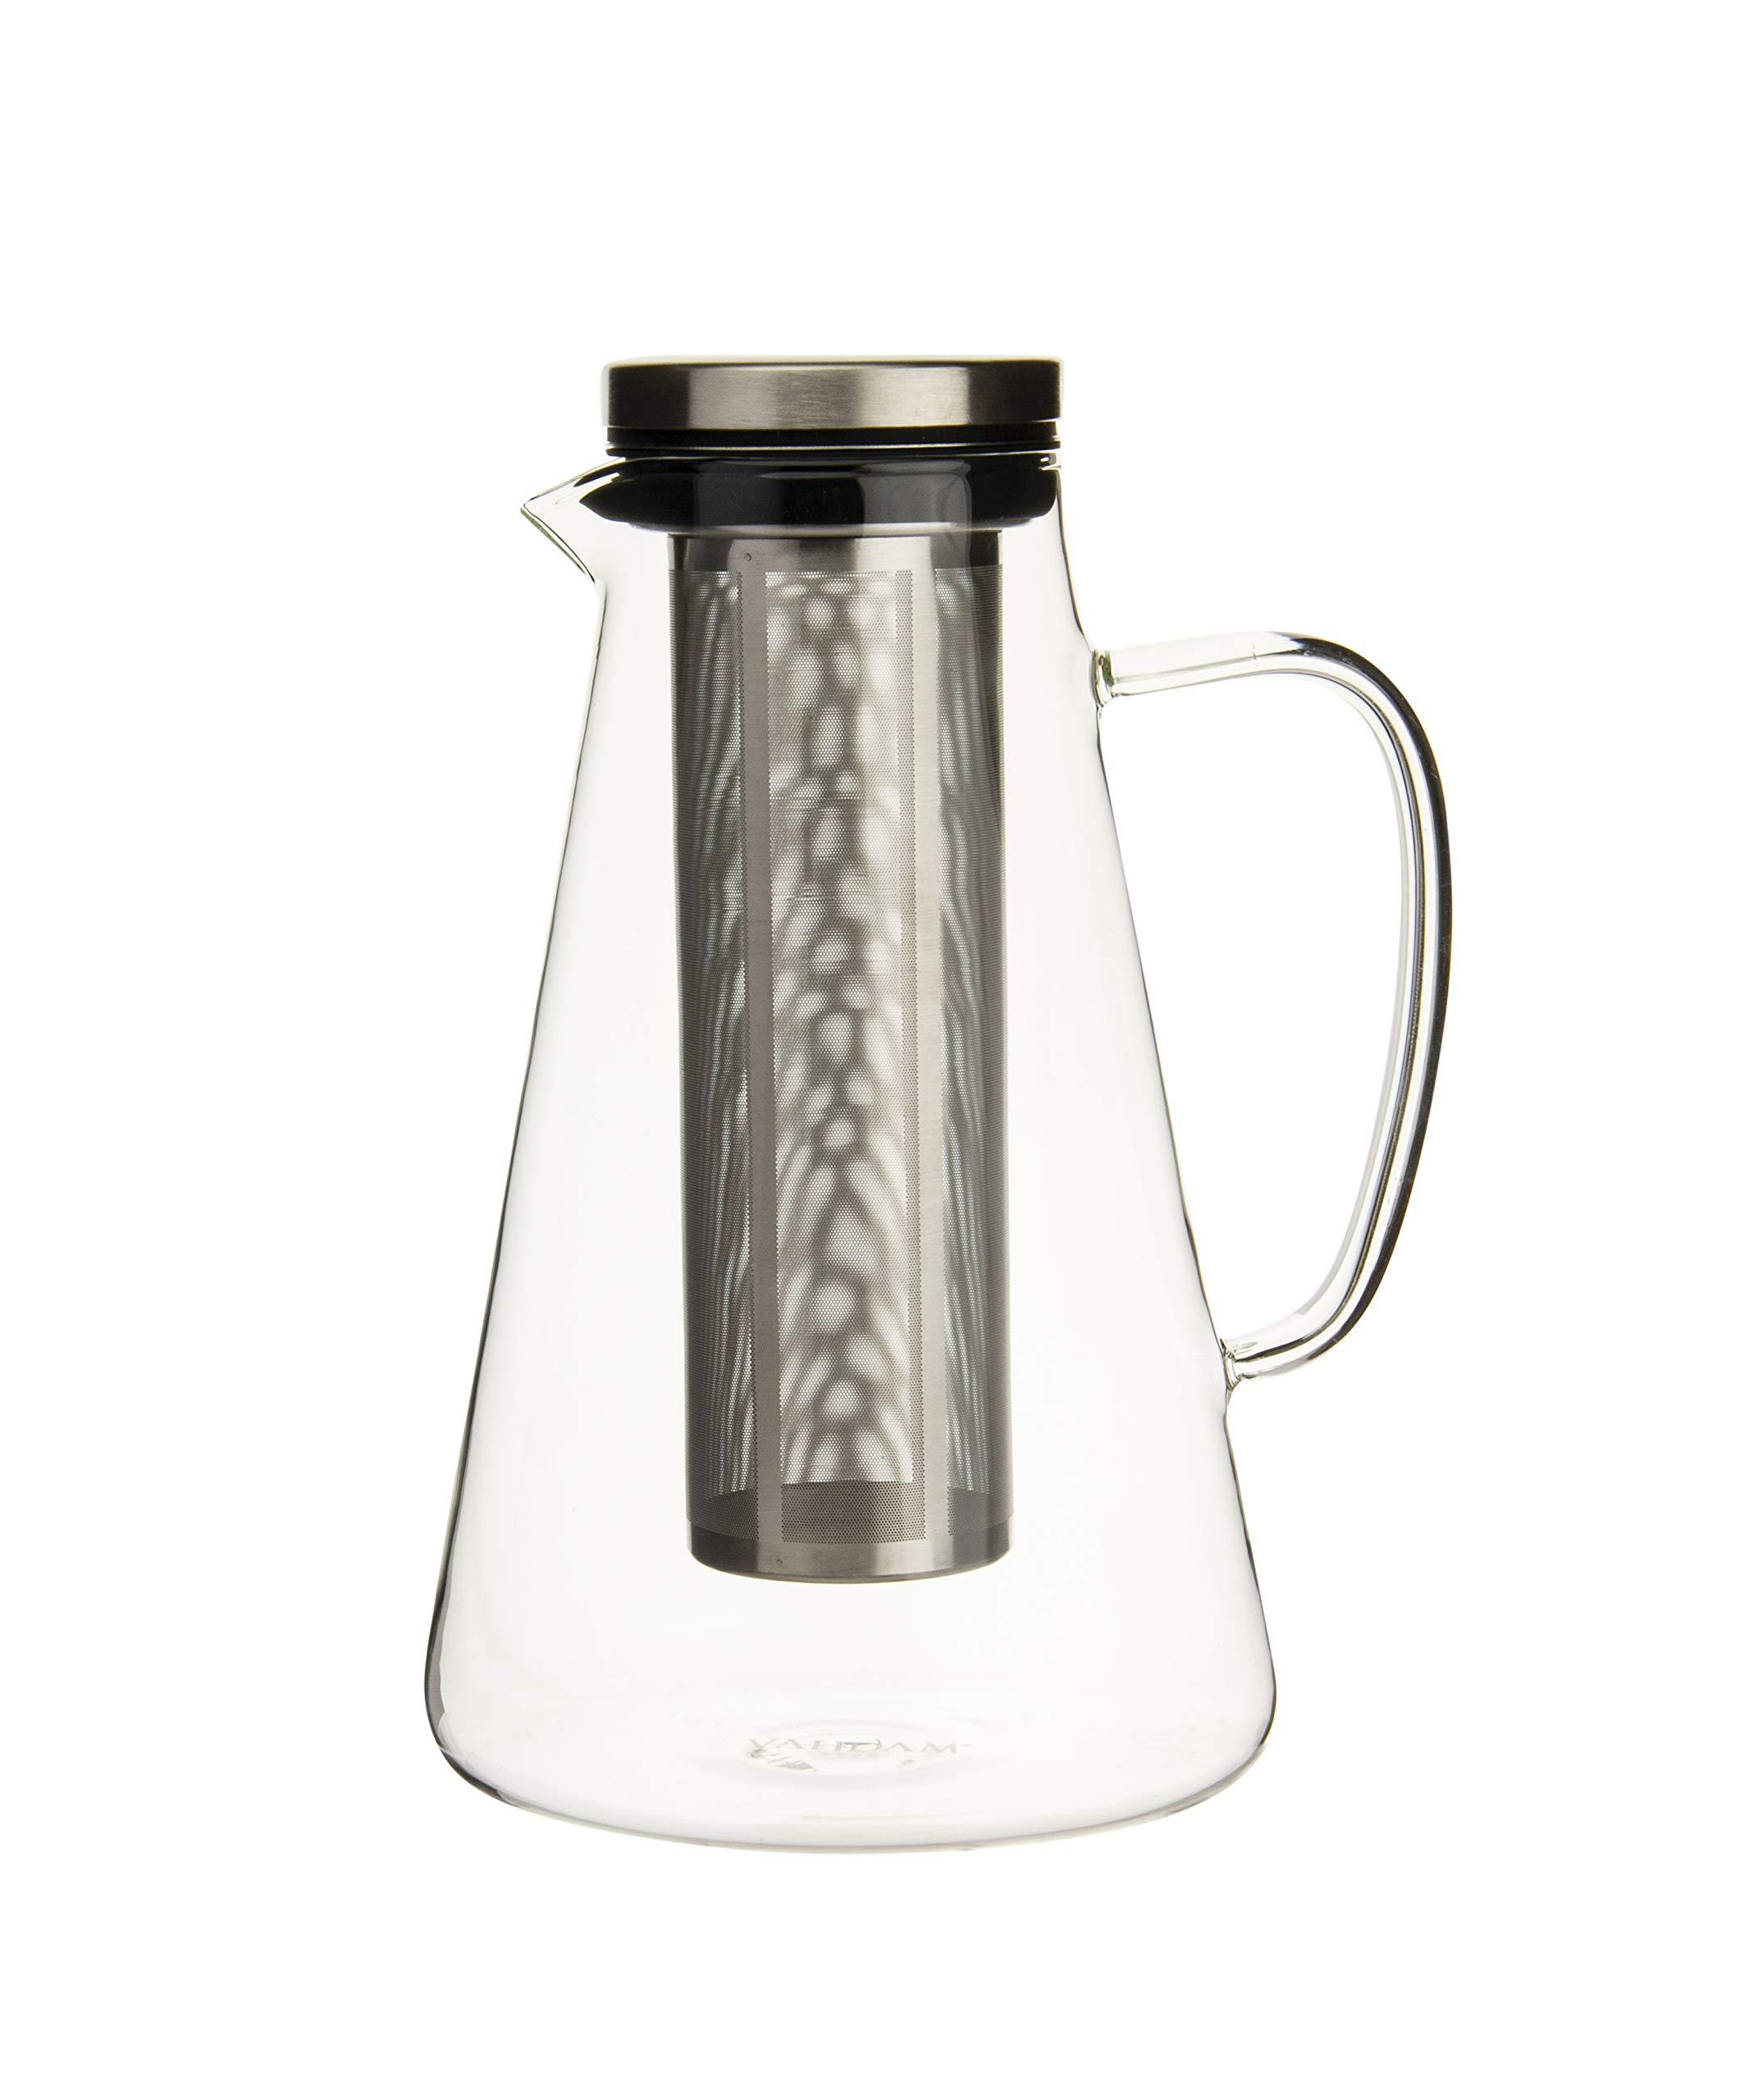 VAHDAM, Ice Tea Pitcher with Lid, 50.7 oz | 100% Safe, Scratch Resistant, Microwave Safe & Heat-Resistant | Iced Tea Pitcher | Borosilicate Glass Pitcher with Lid | Iced Tea Maker | Infuser Pitcher